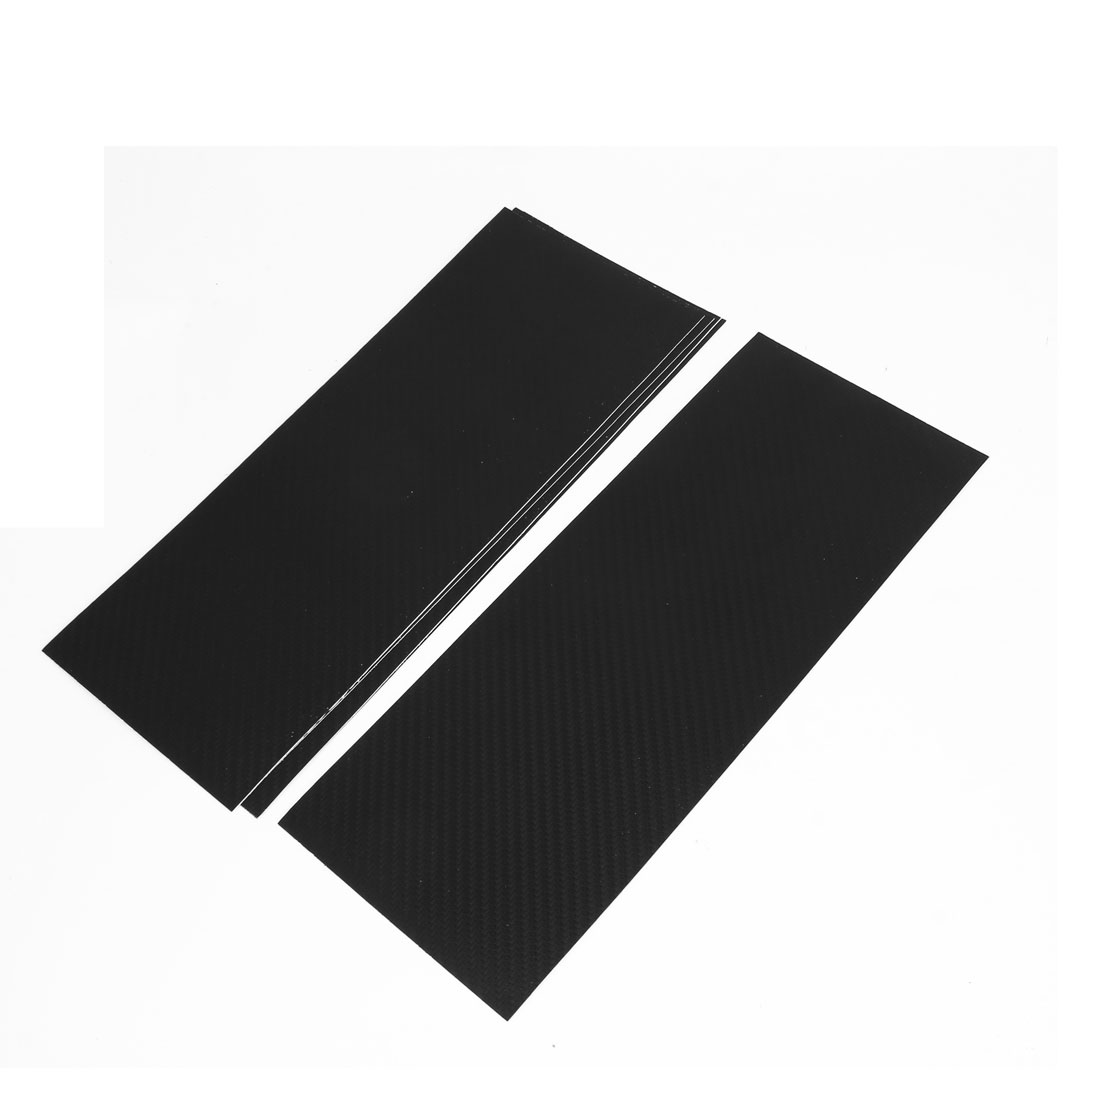 5pcs 300 x 118mm Self Adhesive Carbon Fiber Print Protective Vinyl Film Sticker Black for Car